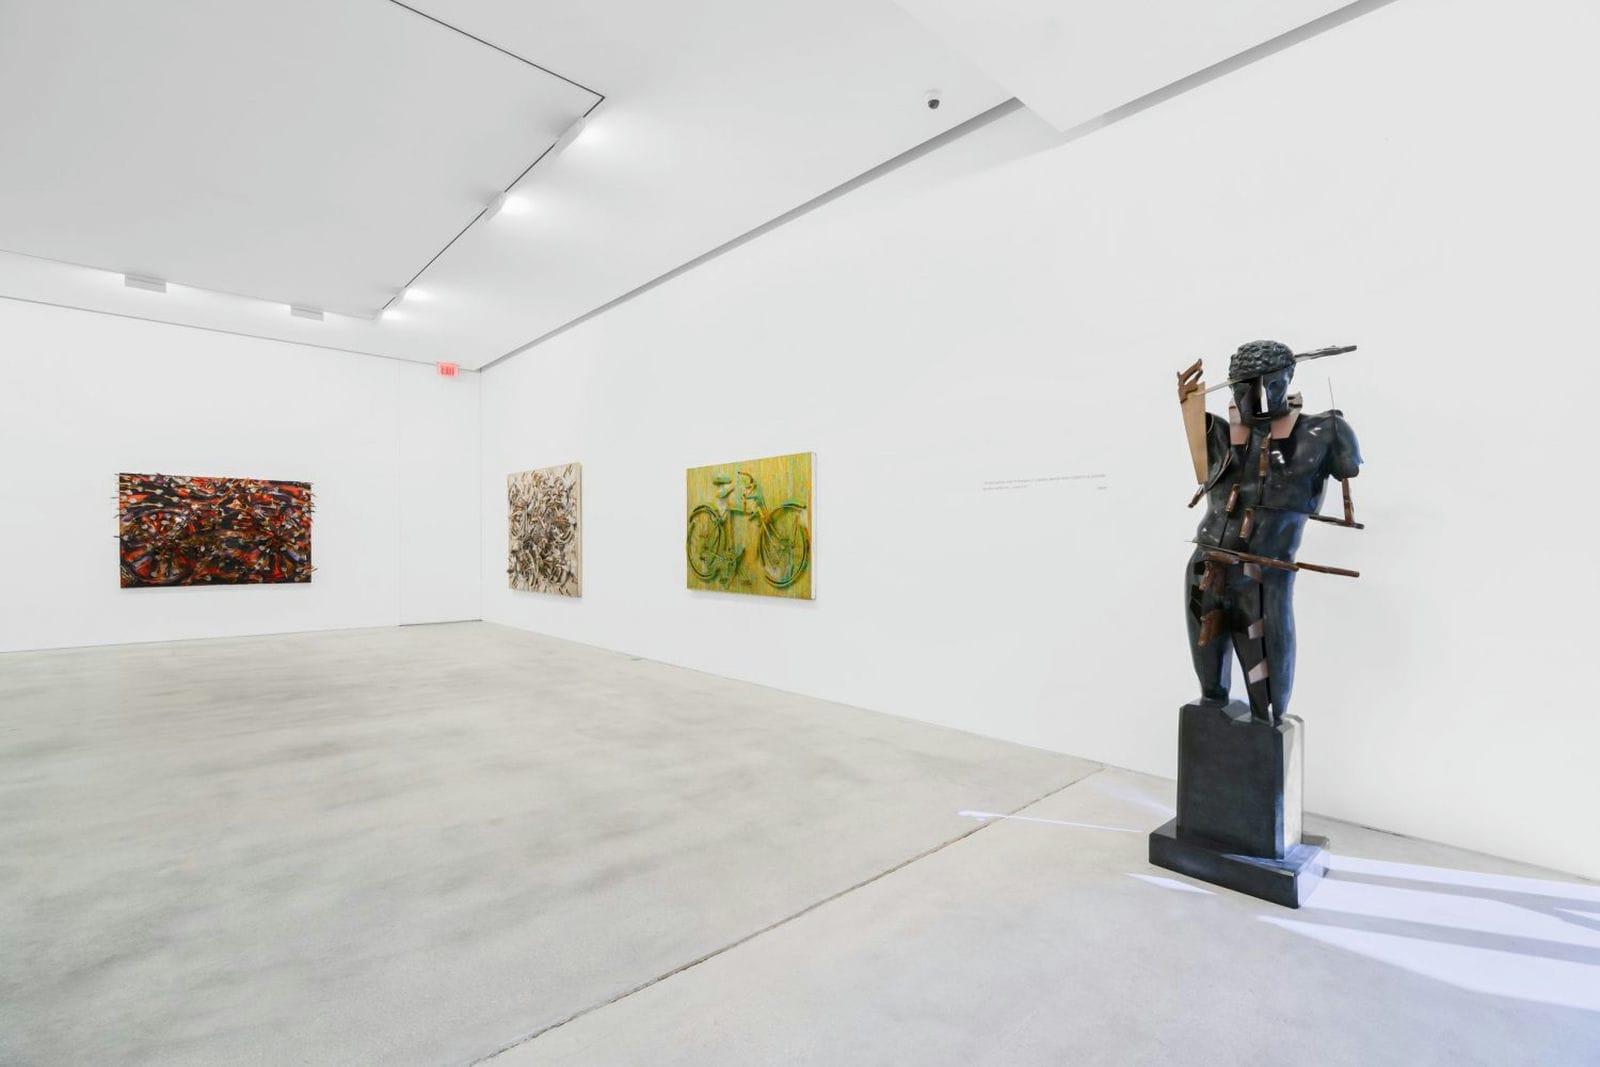 Main Gallery. 2